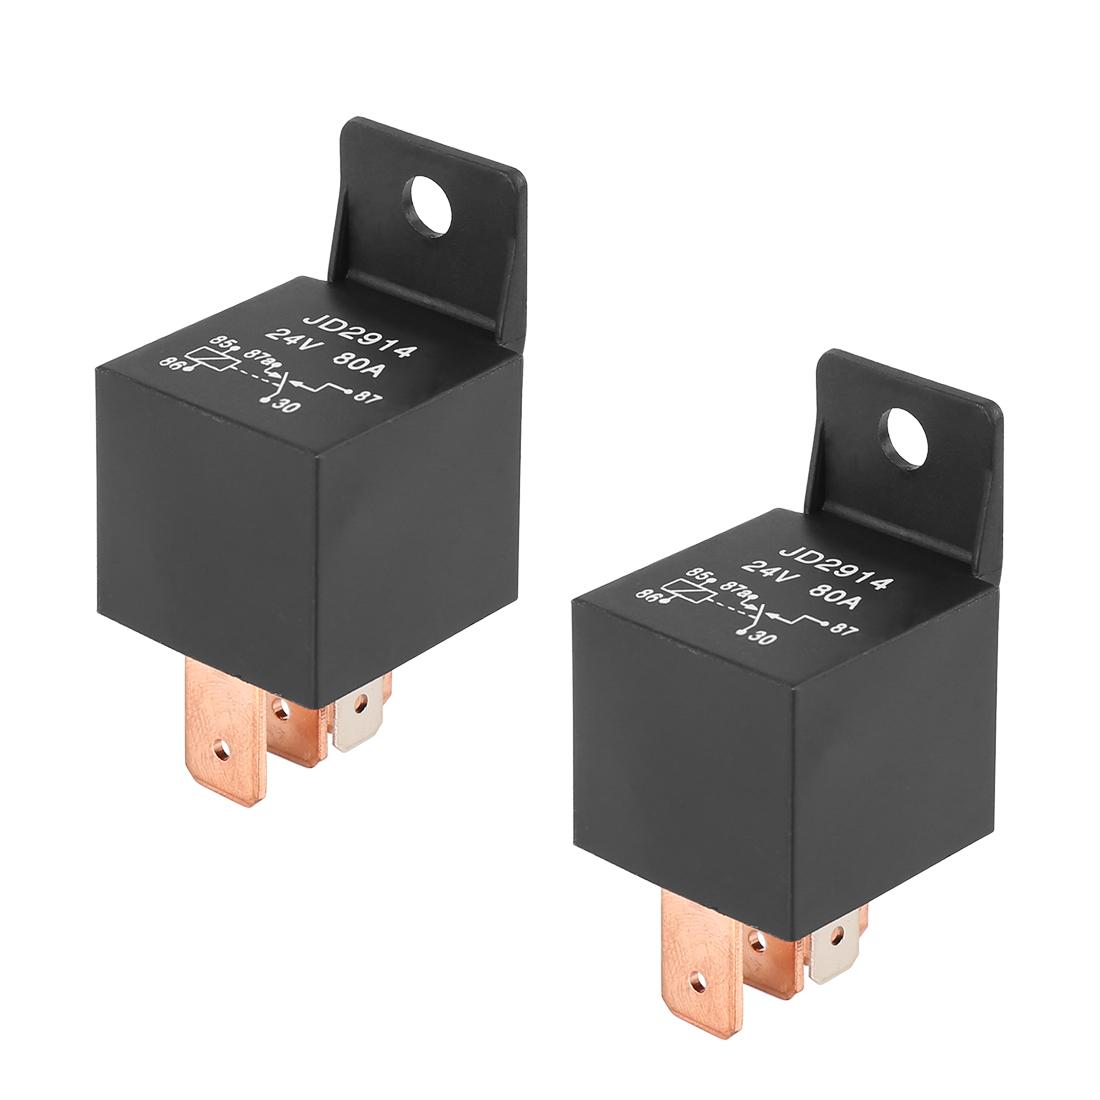 2pcs 5 Pin DC 24V 80Amp Universal Car Vehicle Relay Switch Power Starter Black